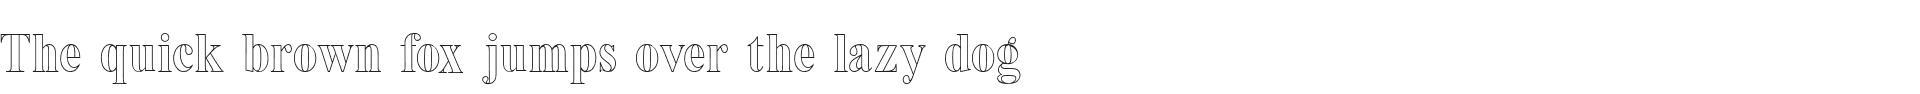 Sothel Serif.otf